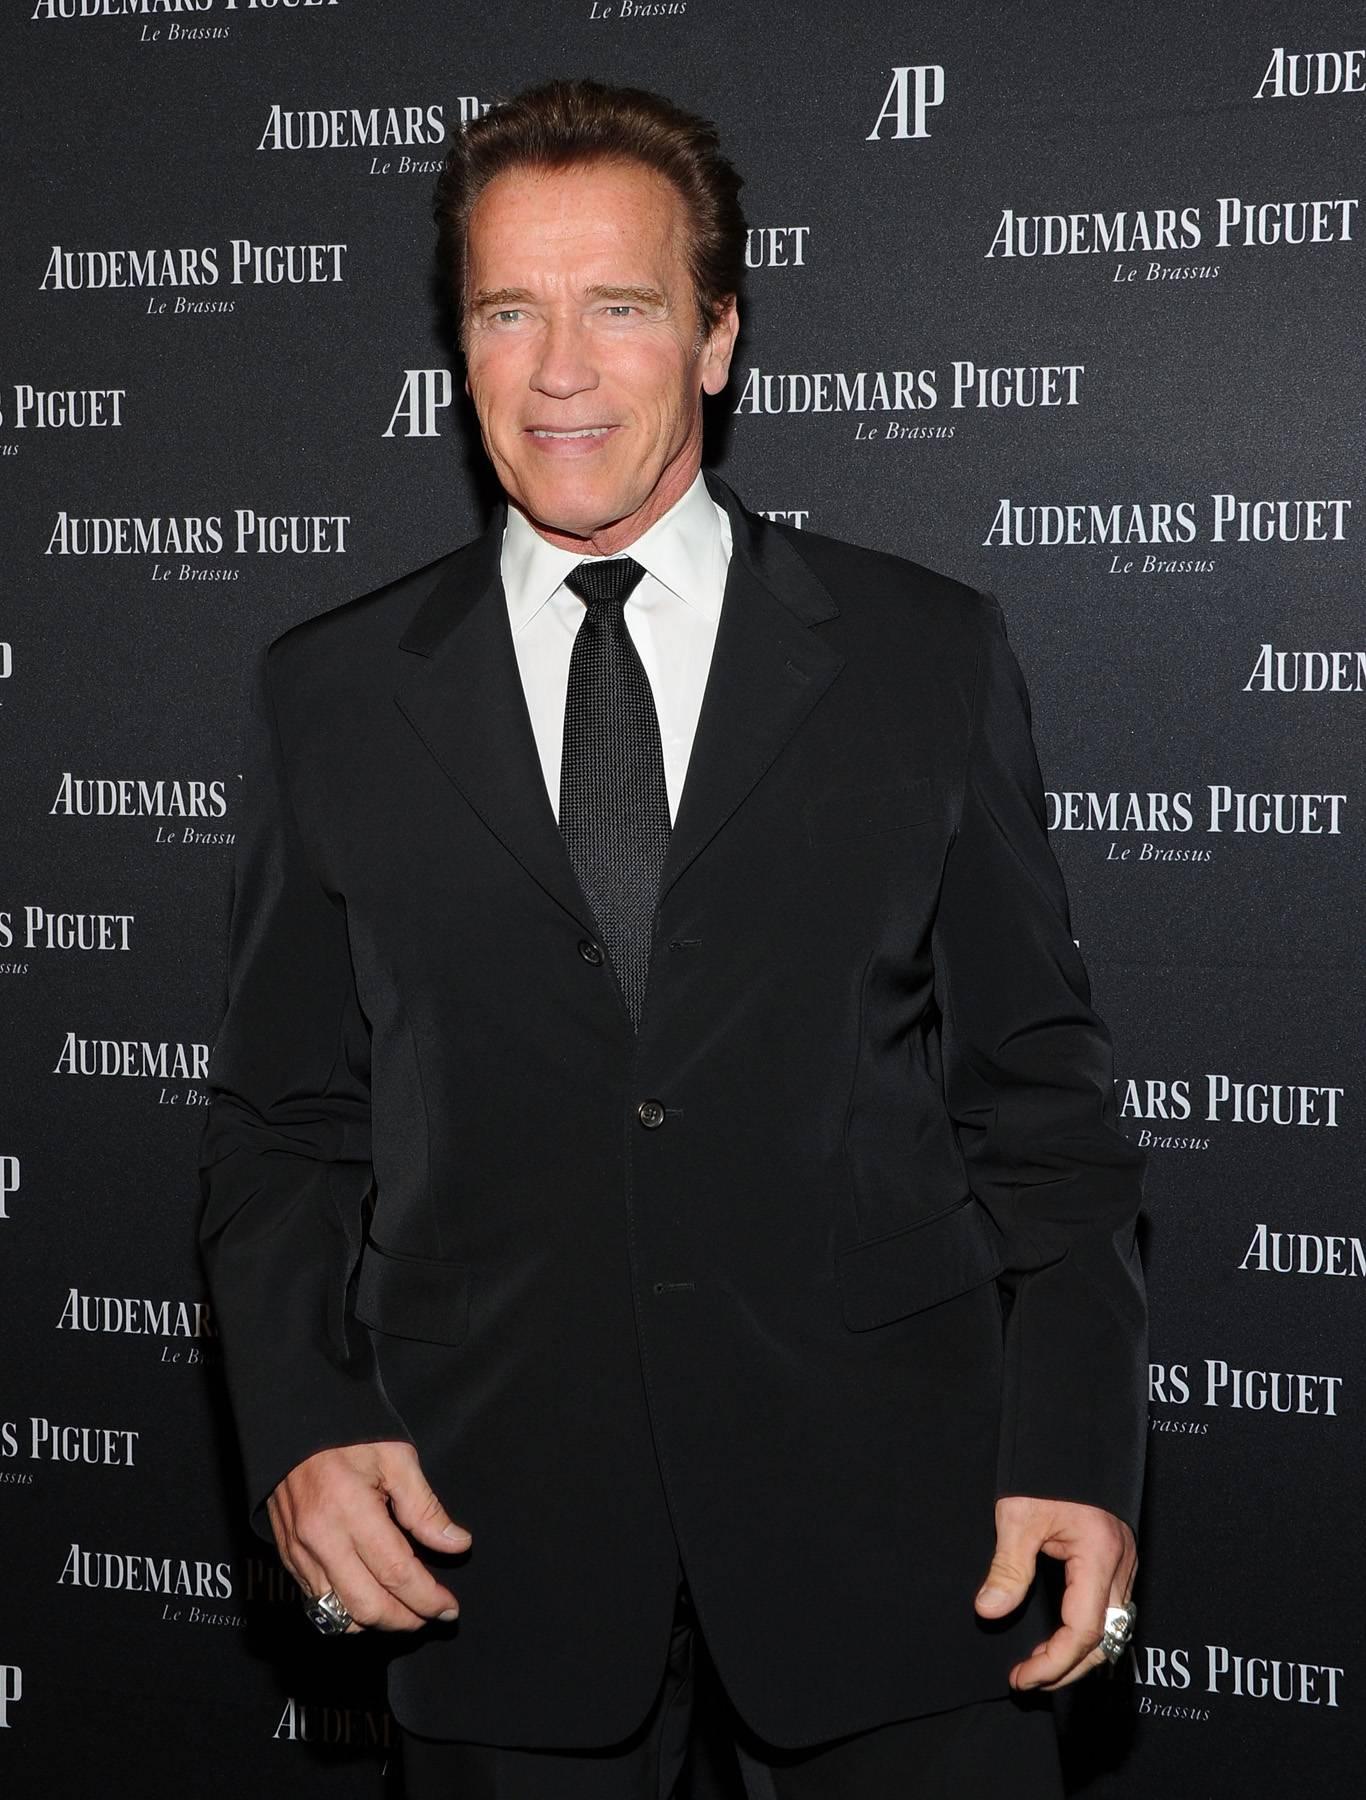 Arnold Schwarzenegger - March 27, 2014 - Arnold Schwarzenegger came to Sabotage the 106 & Park set! Watch a clip now!(Photo: Jason Kempin/Getty Images)